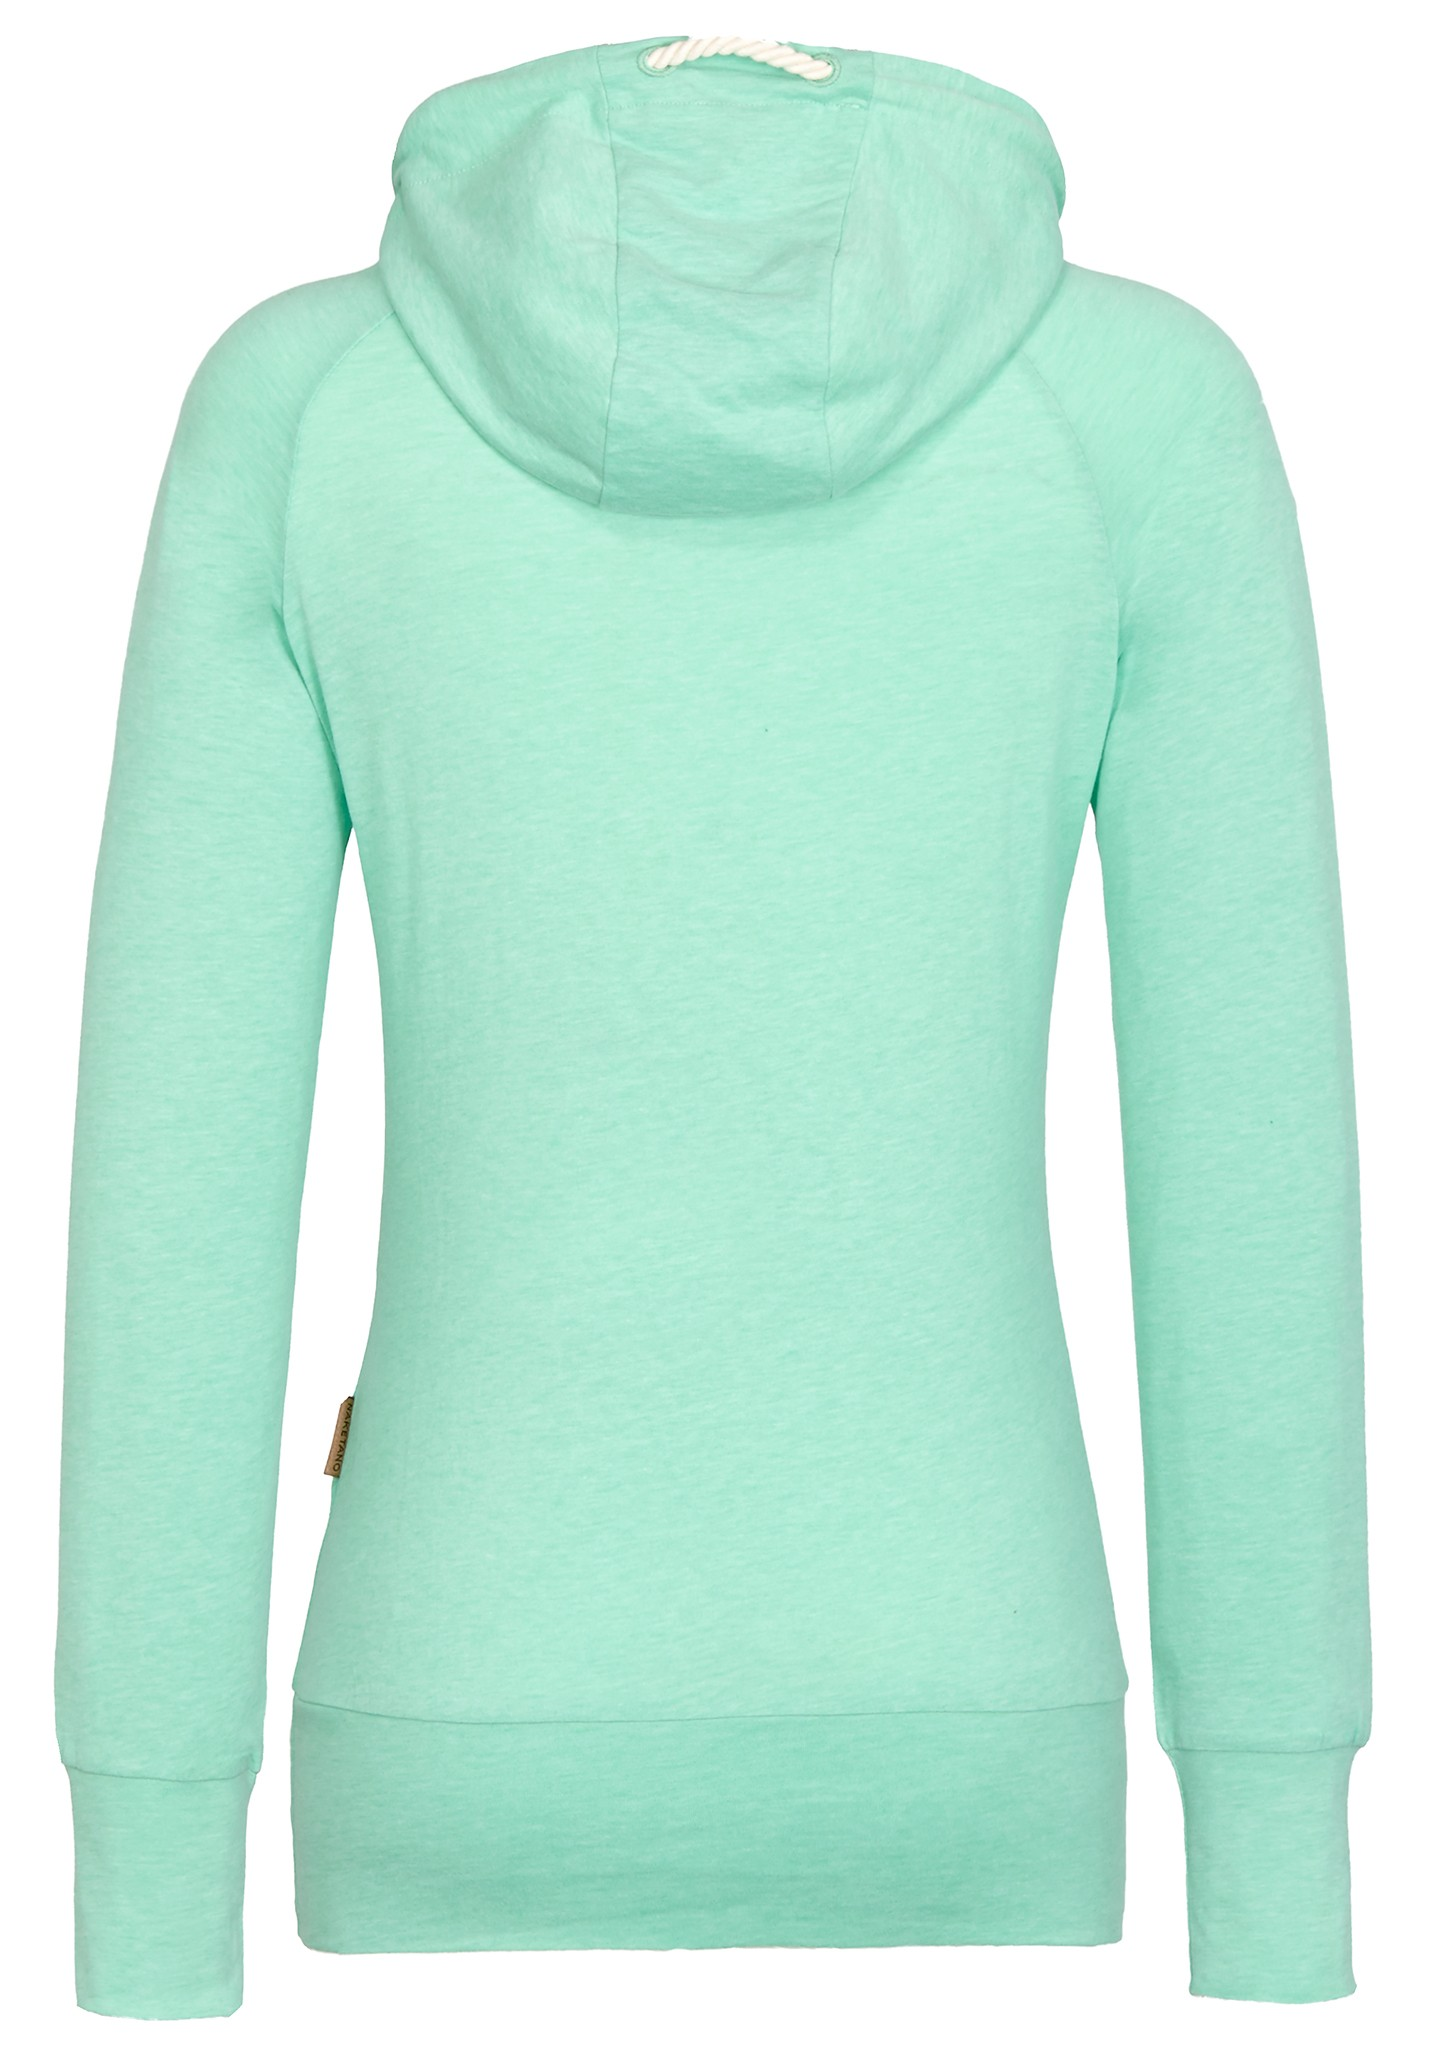 neu naketano mandy vi hooded sweat damen kapuzenpullover pullover hoodie ebay. Black Bedroom Furniture Sets. Home Design Ideas